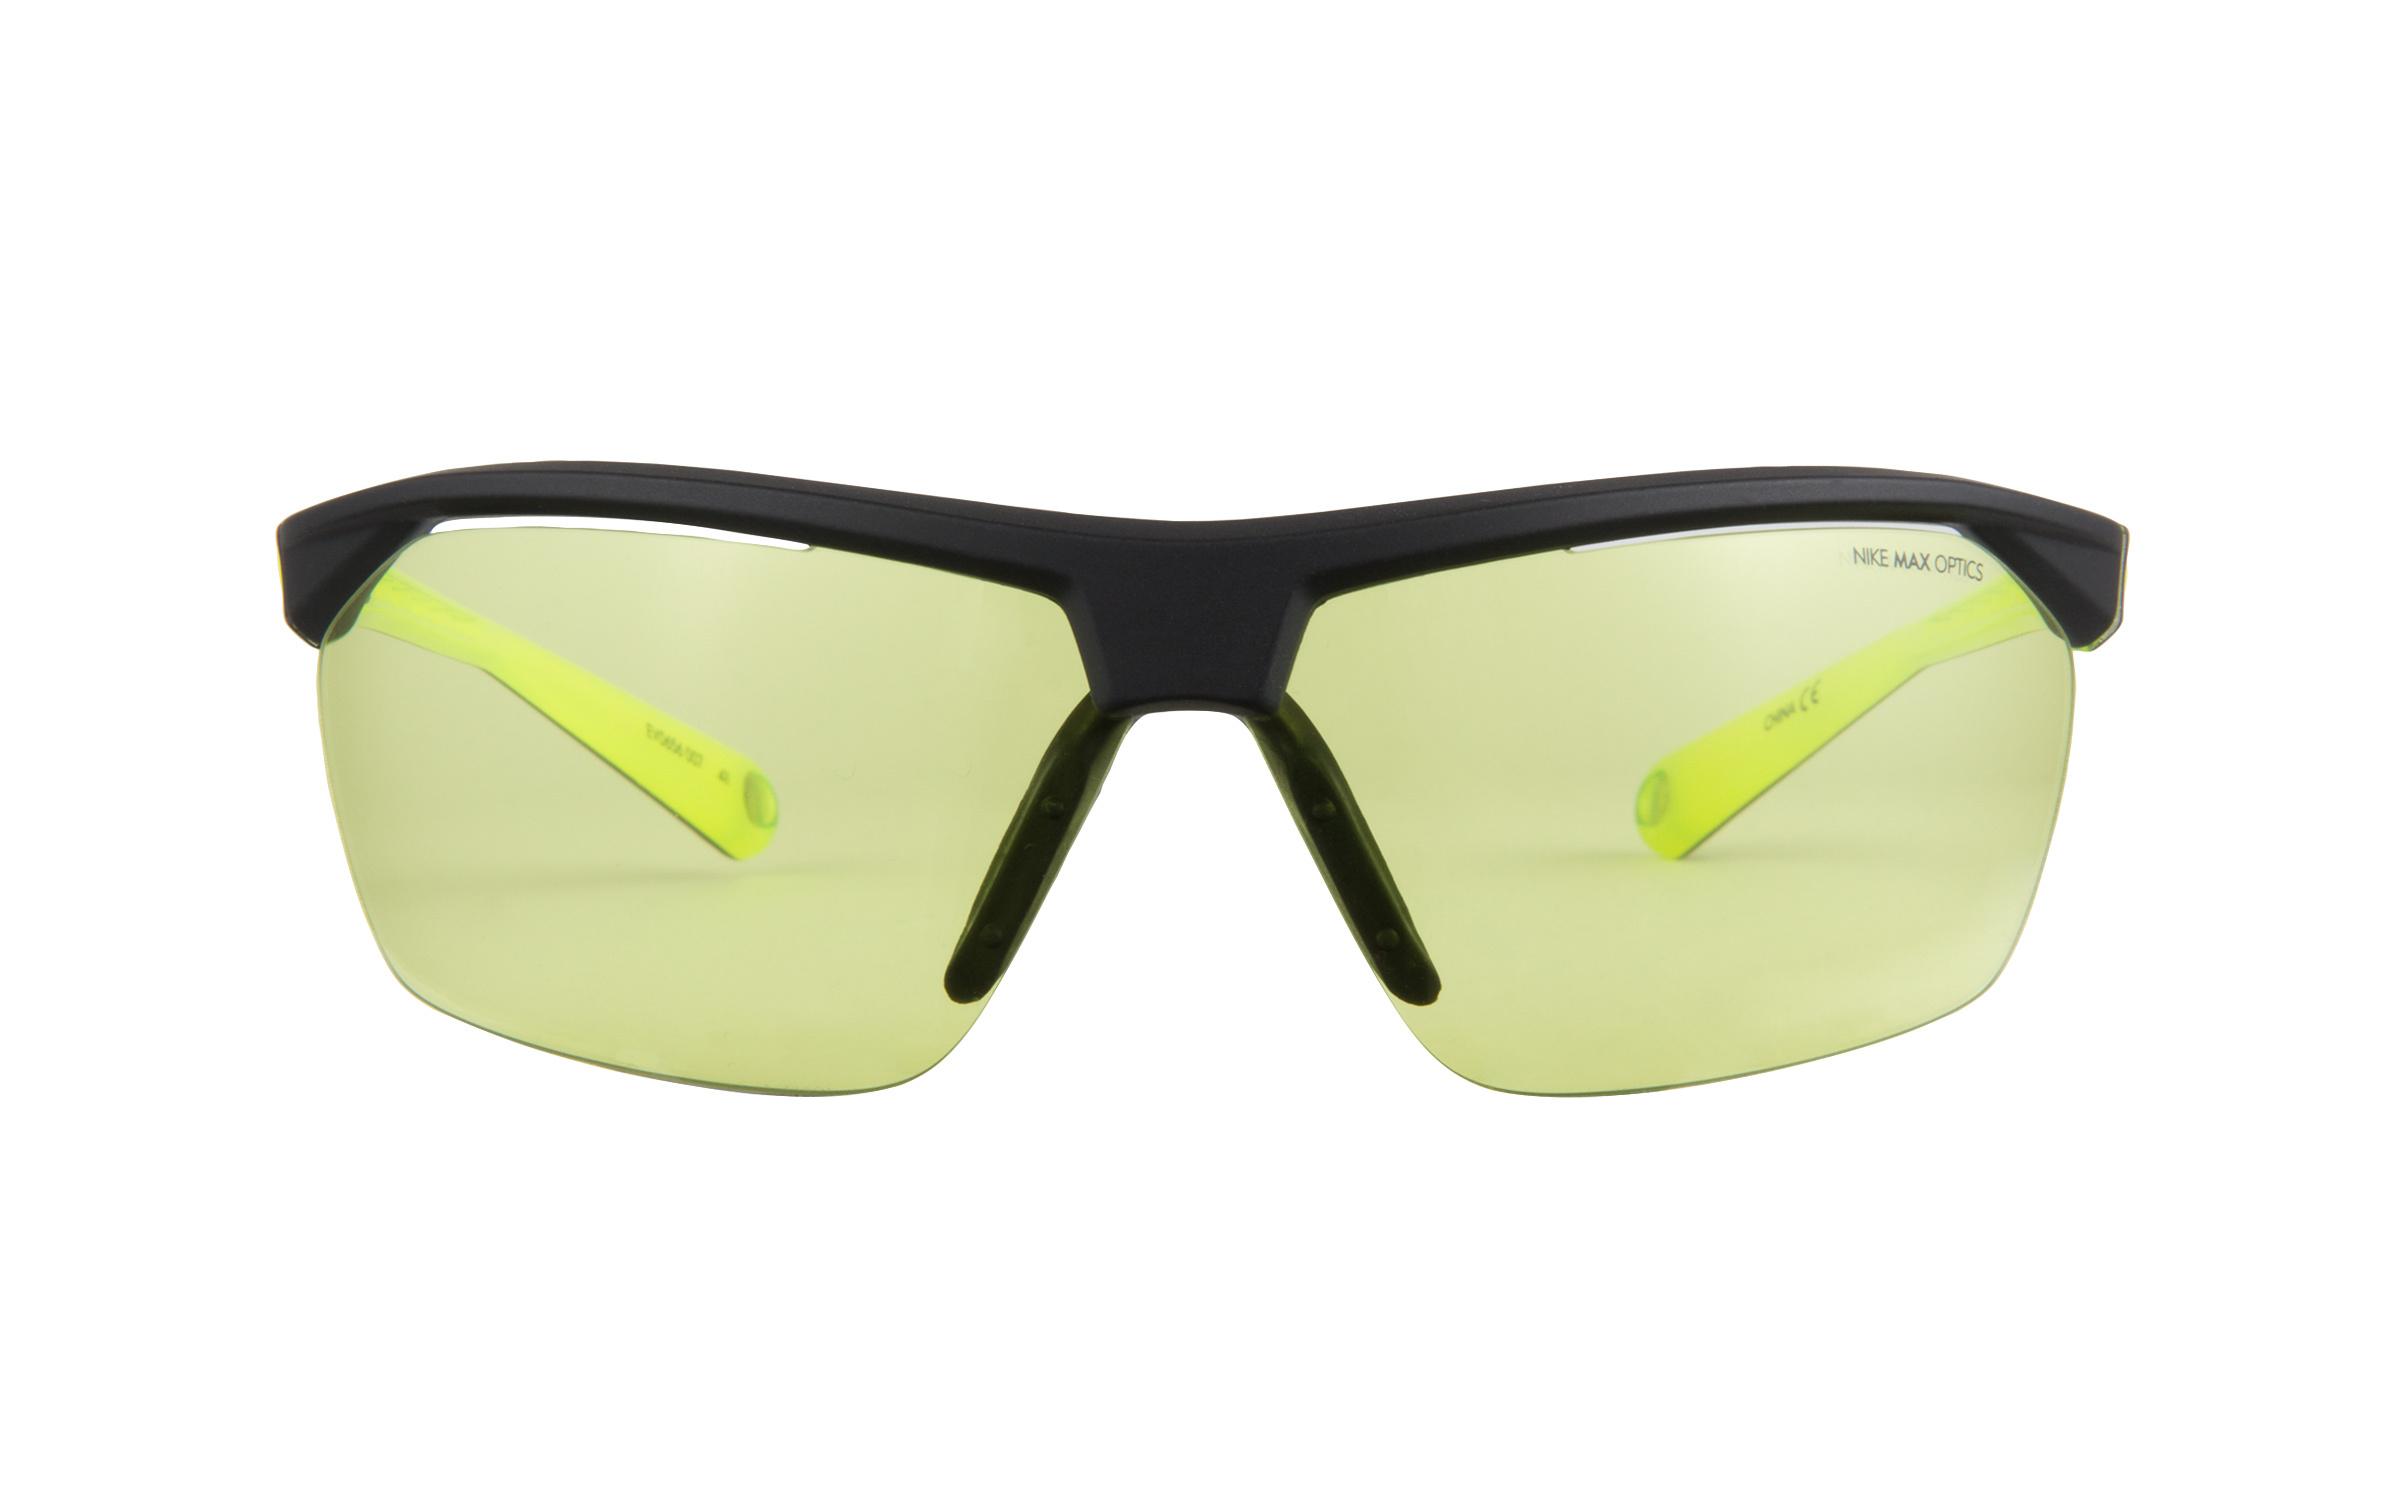 Nike Tailwind 12 007 Matte Black Sunglasses